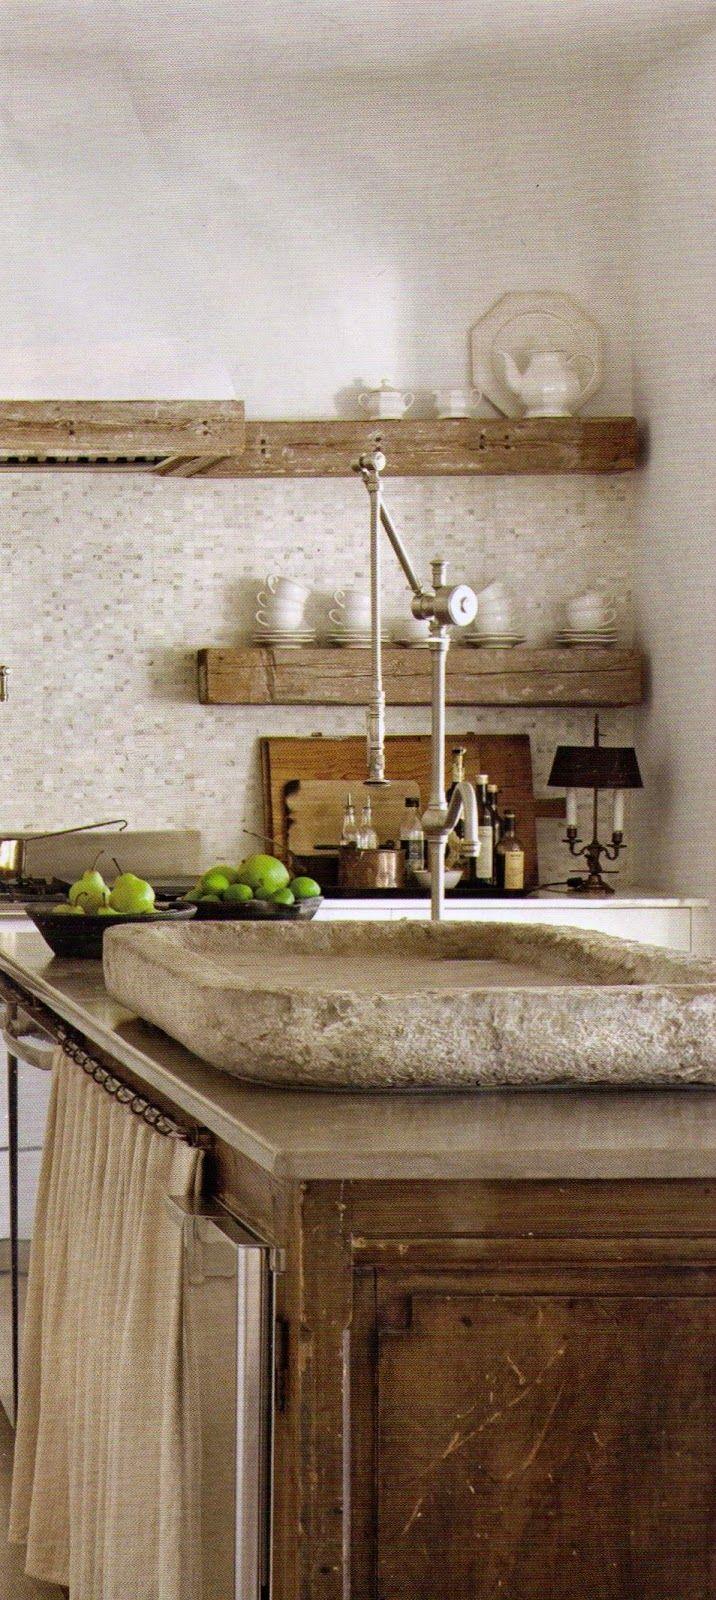 best 25+ stone sink ideas on pinterest | bathroom sink bowls